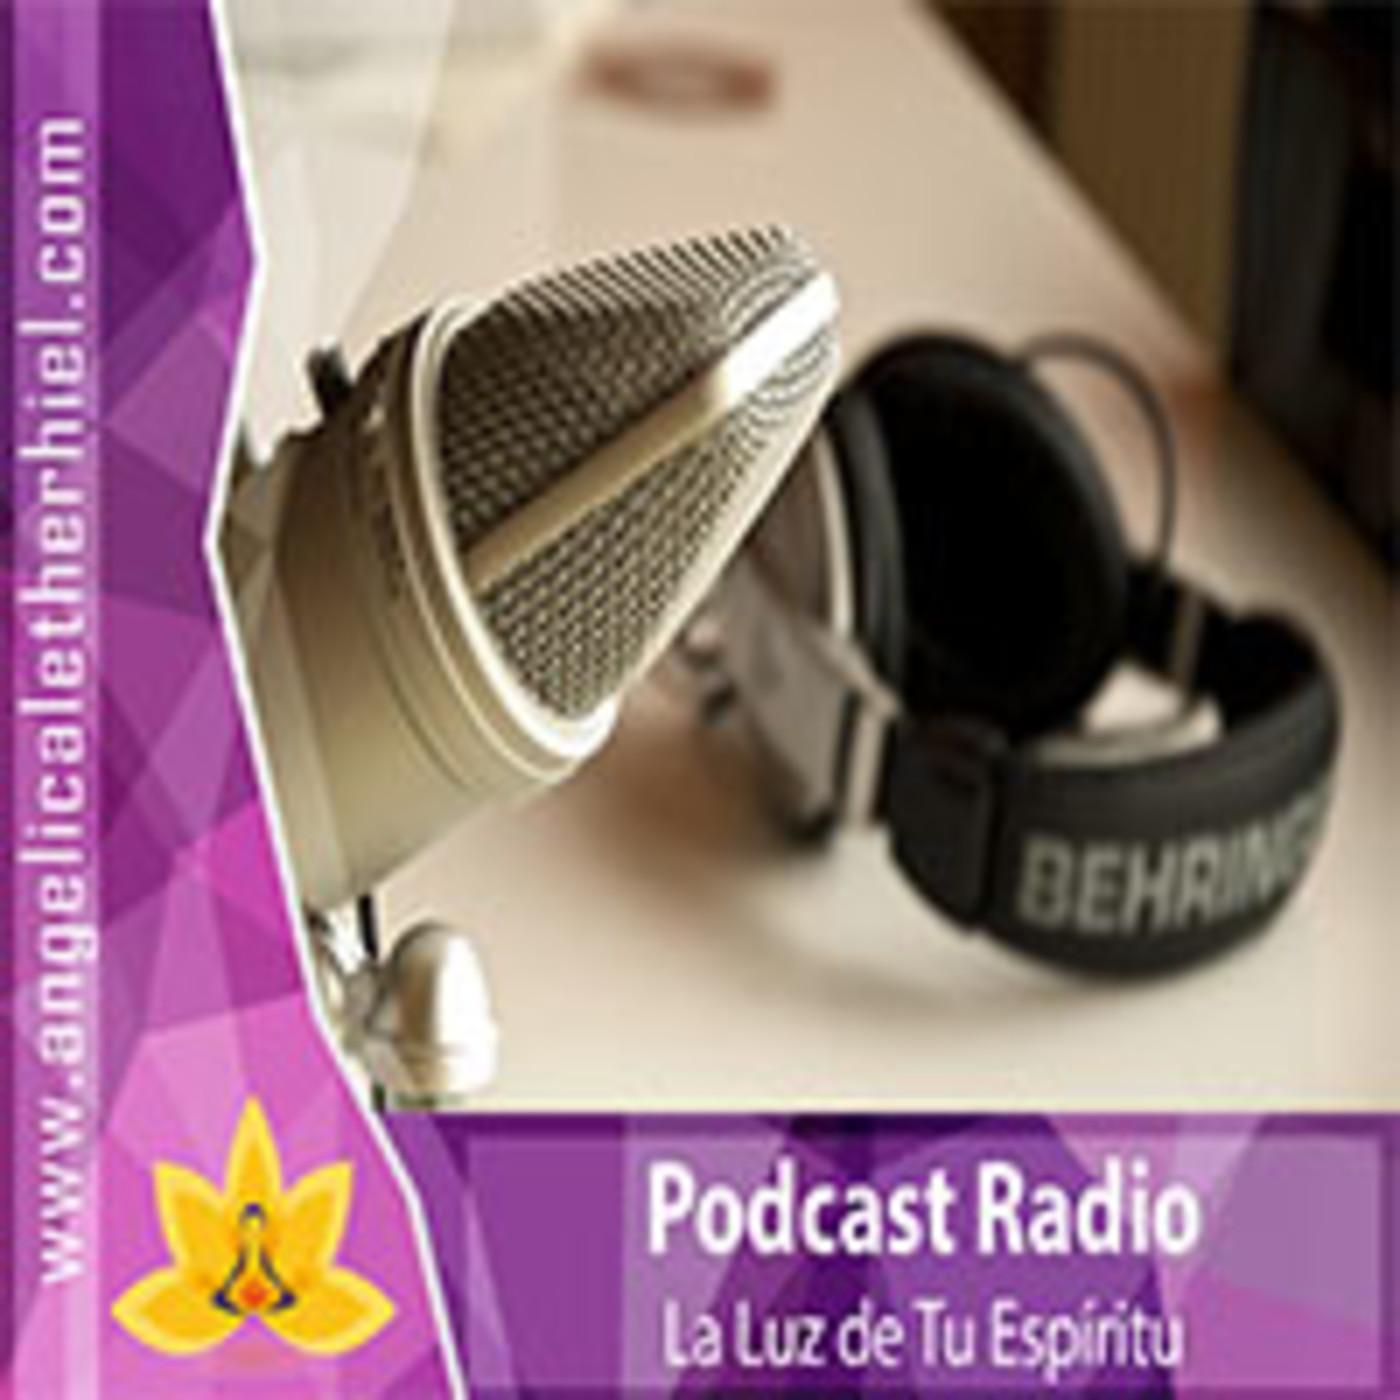 <![CDATA[Podcast Radio Extensiones de Amor]]>